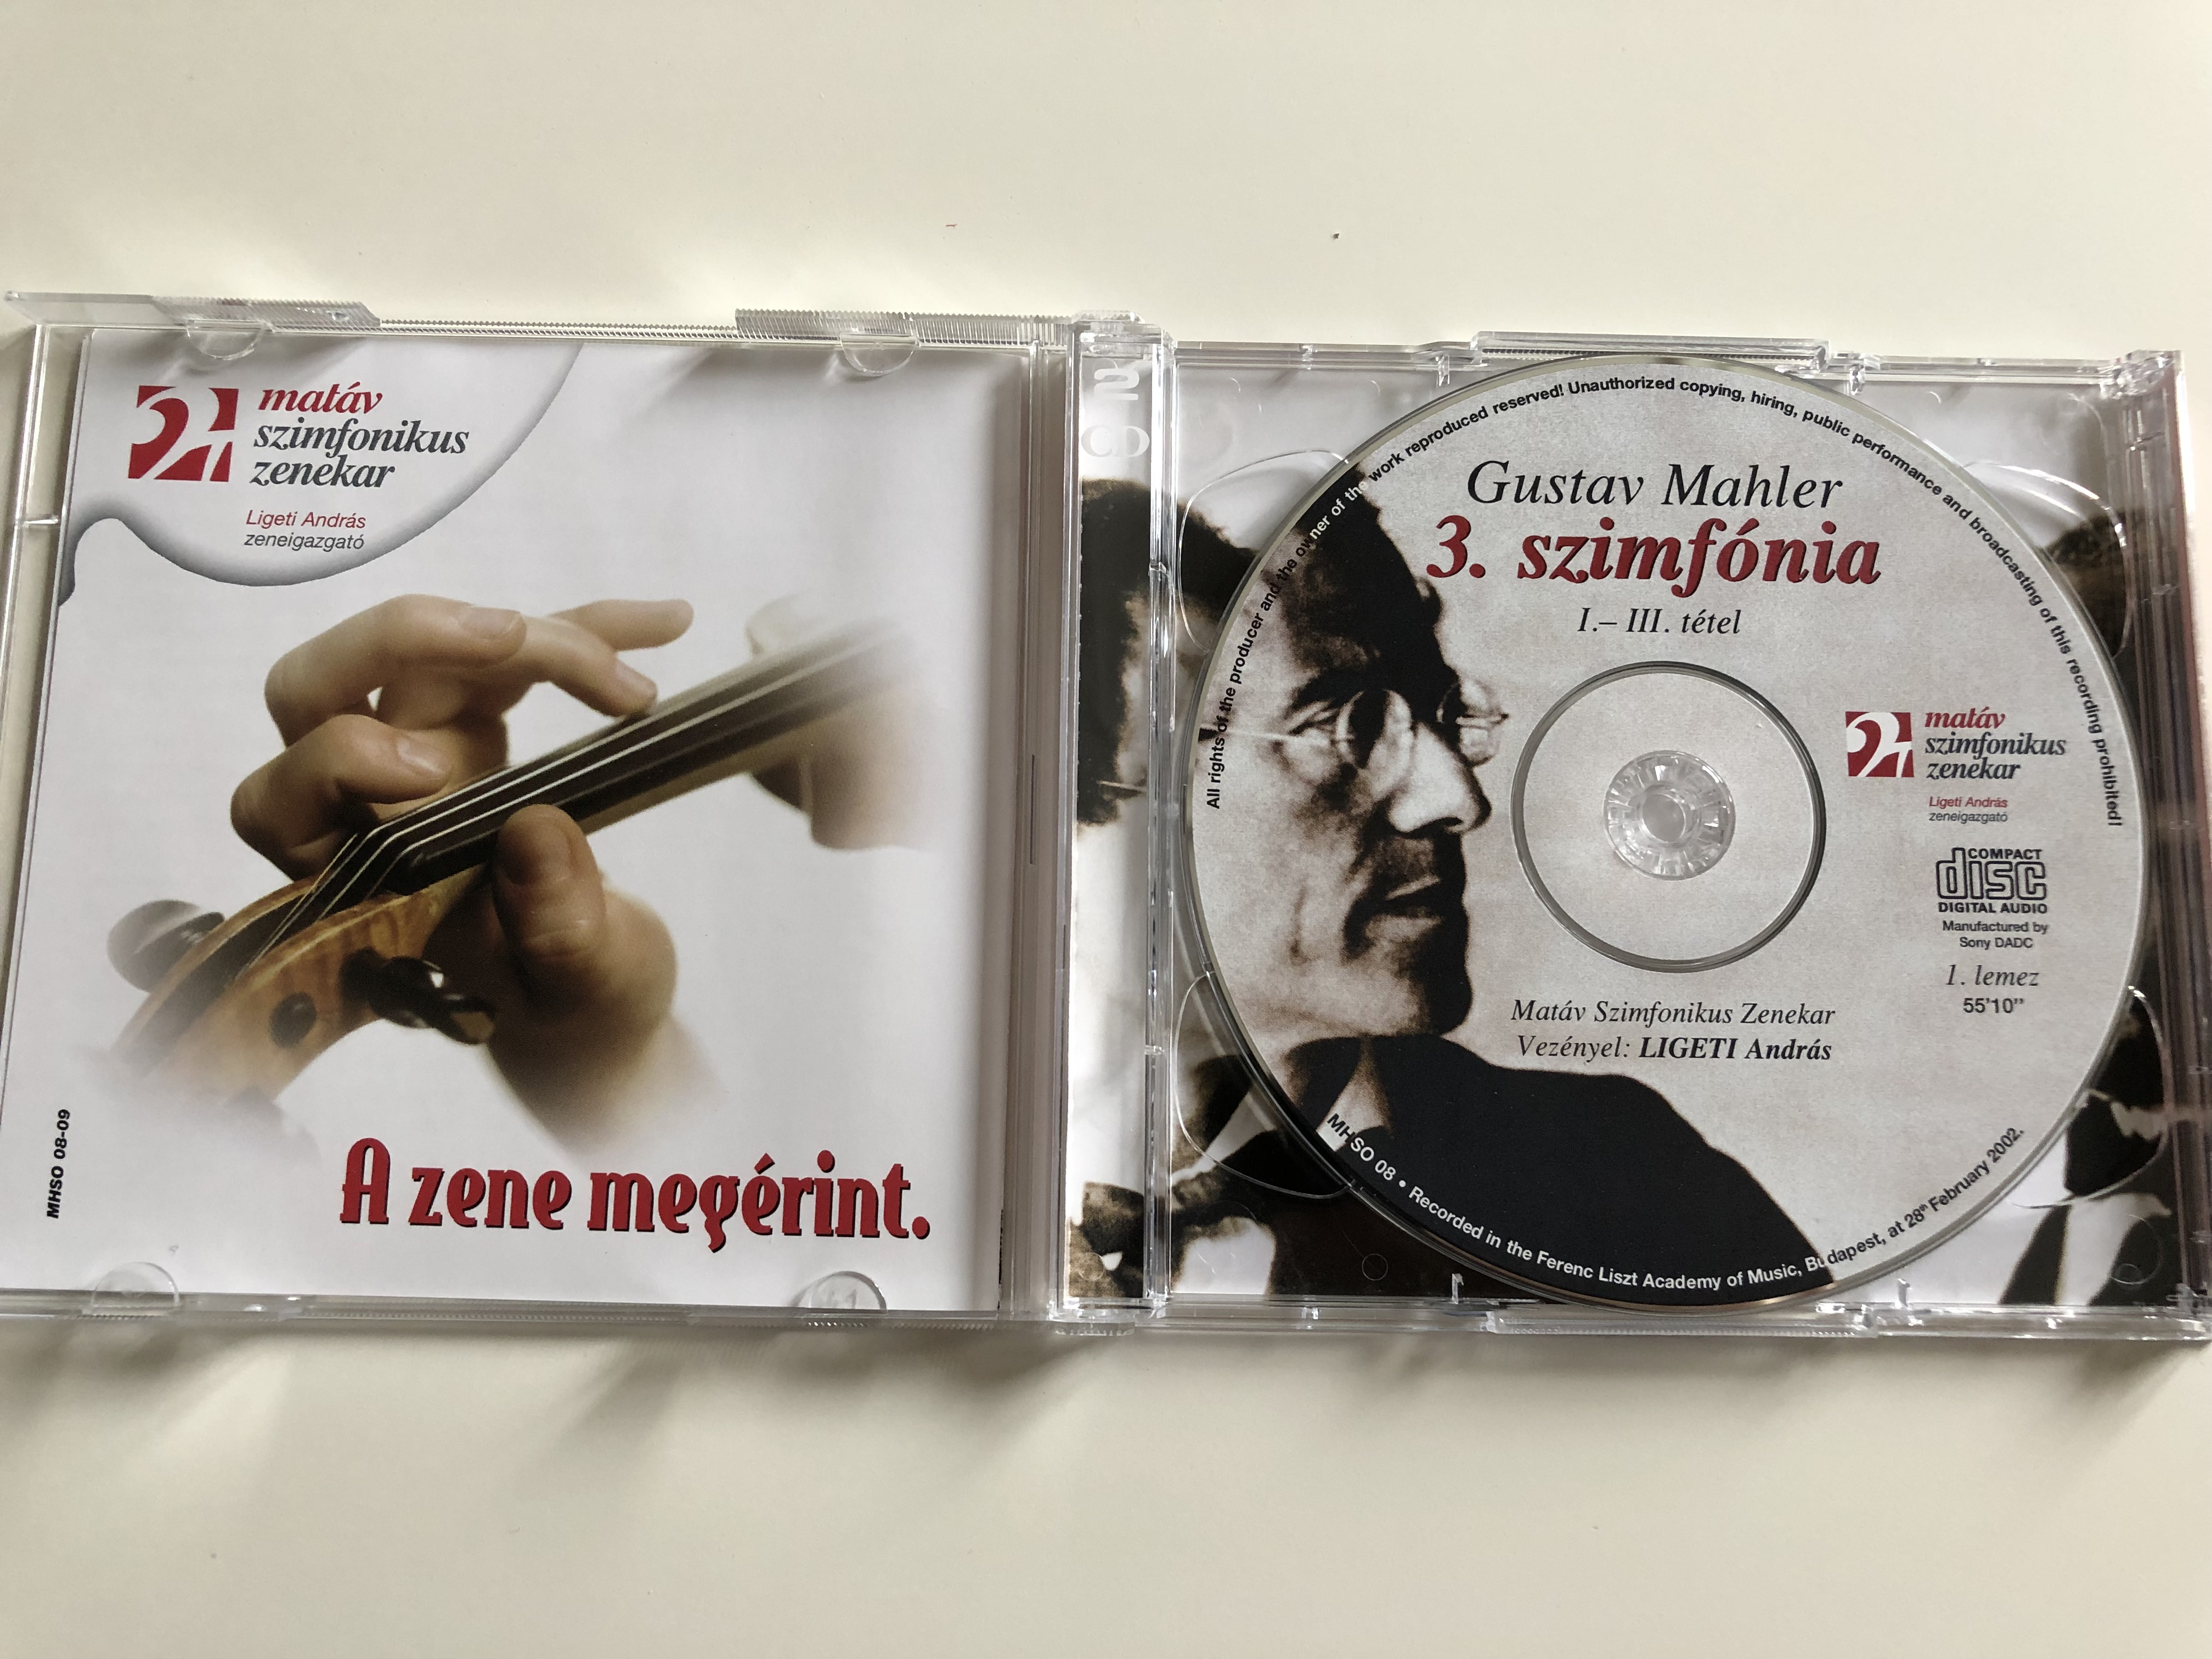 gustav-mahler-3.-szimf-nia-richard-strauss-r-zsalovag-szvit-mat-v-szimfonikus-zenekar-mat-v-symphonic-orchestra-hungary-conducted-by-ligeti-andr-s-concert-recording-double-cd-mhso-08-09-4-.jpg